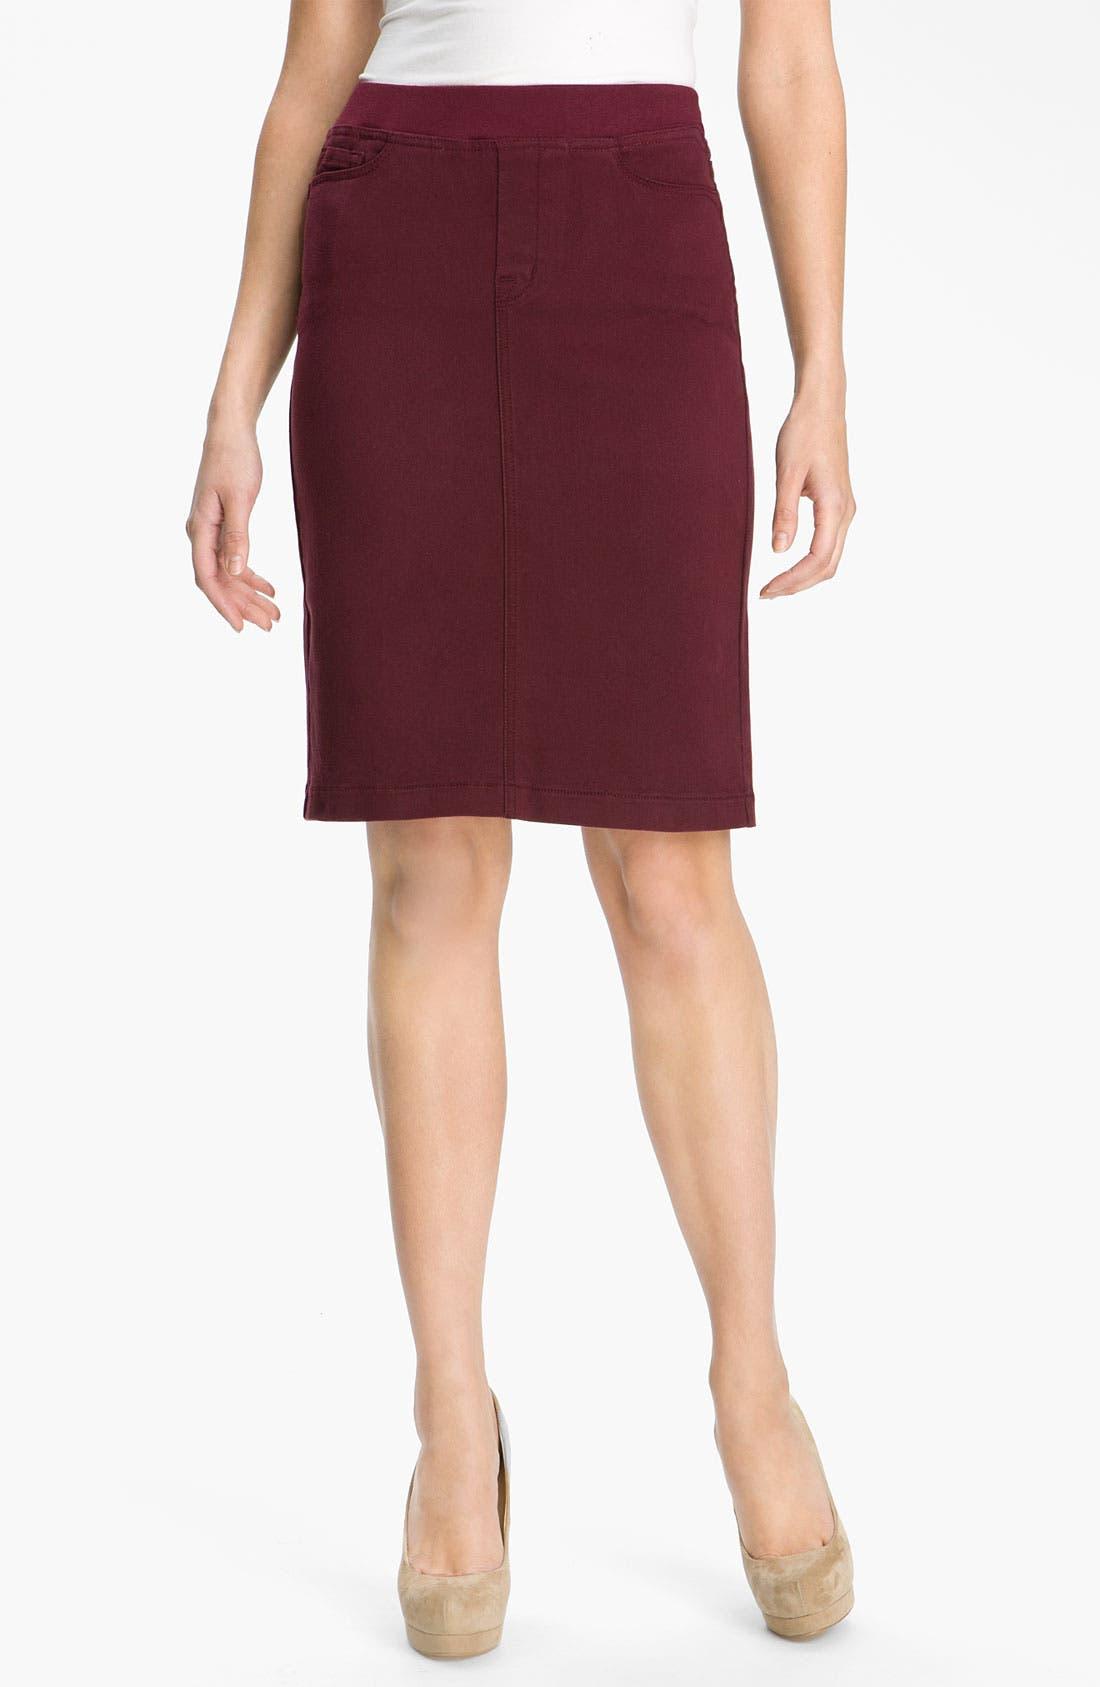 Alternate Image 1 Selected - NYDJ 'Caitlyn' Pull On Skirt